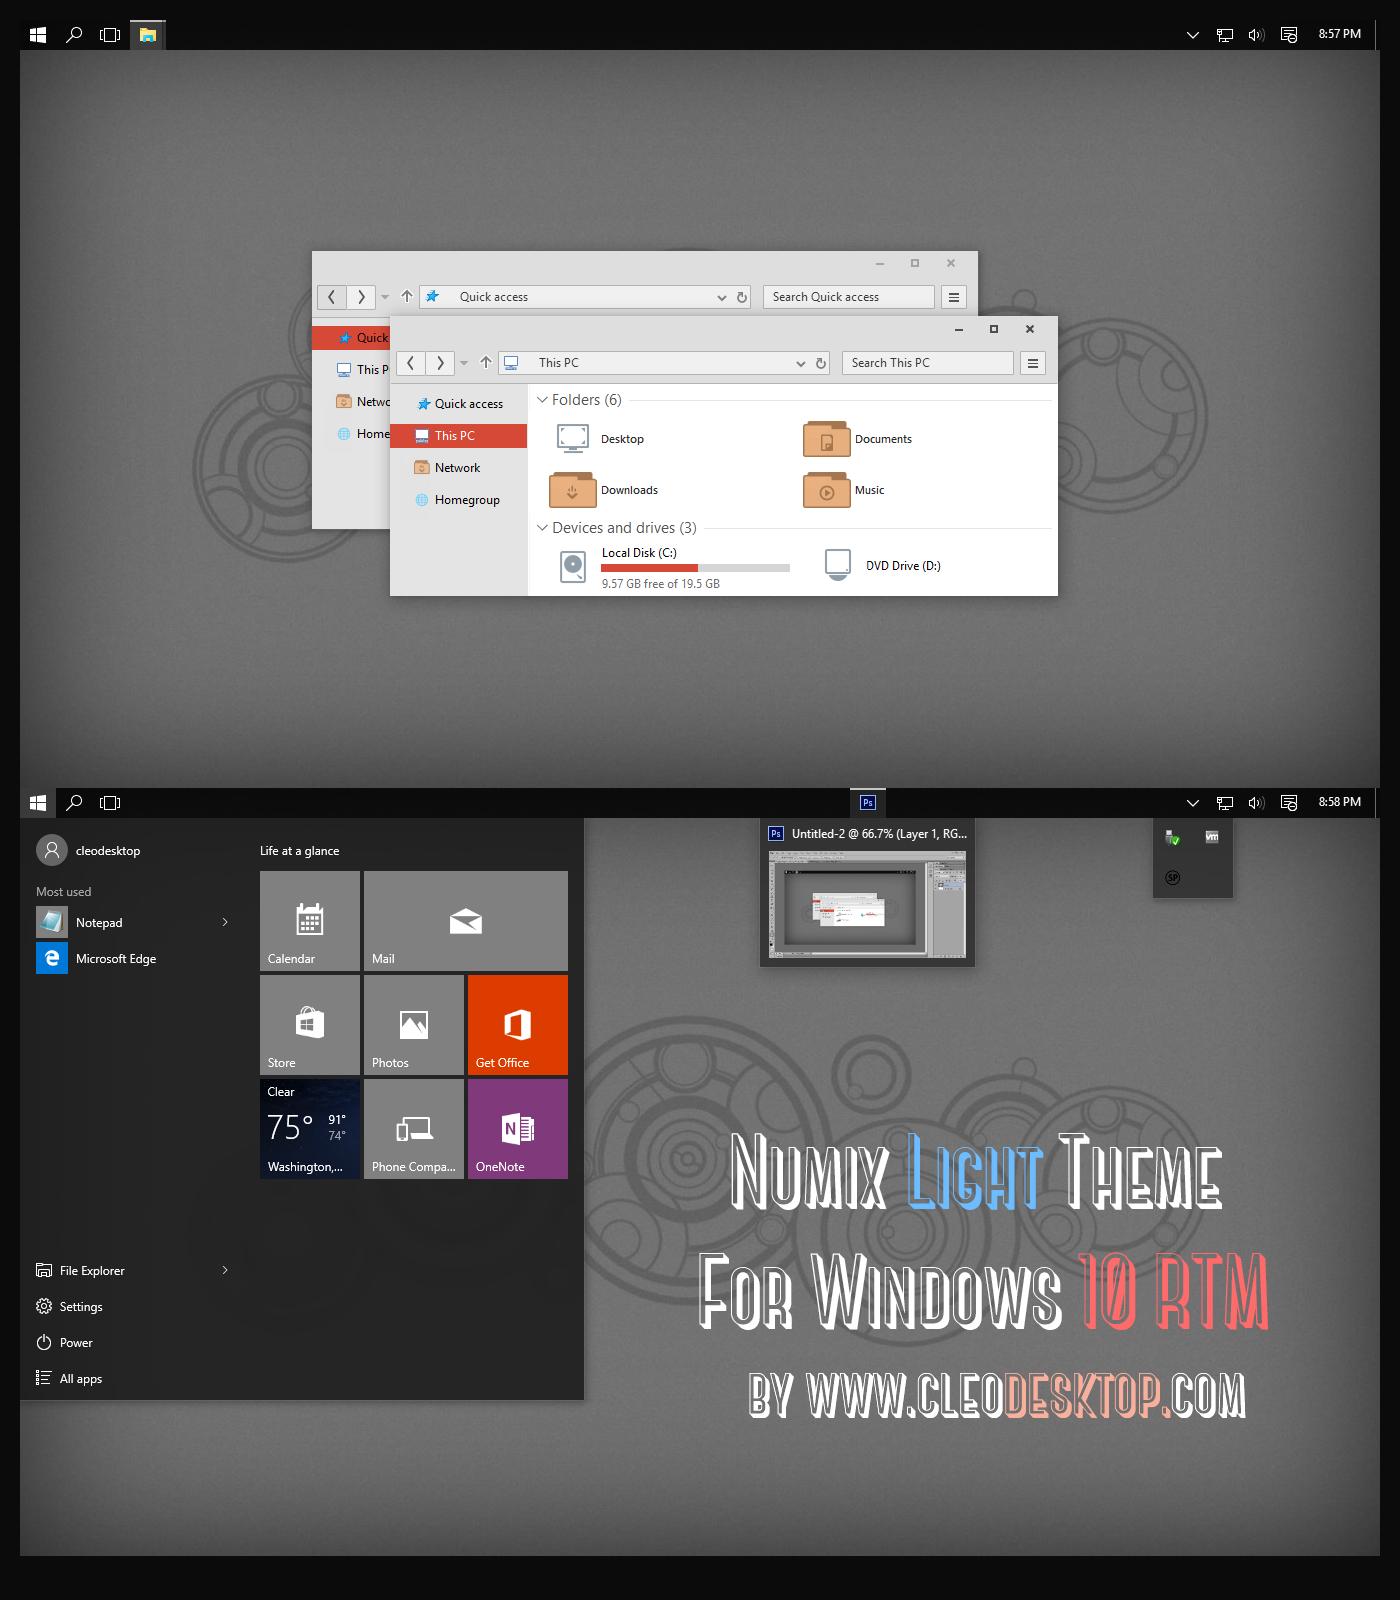 Free Windows 10 Themes And Skins 2019: Tema Evolucion 4